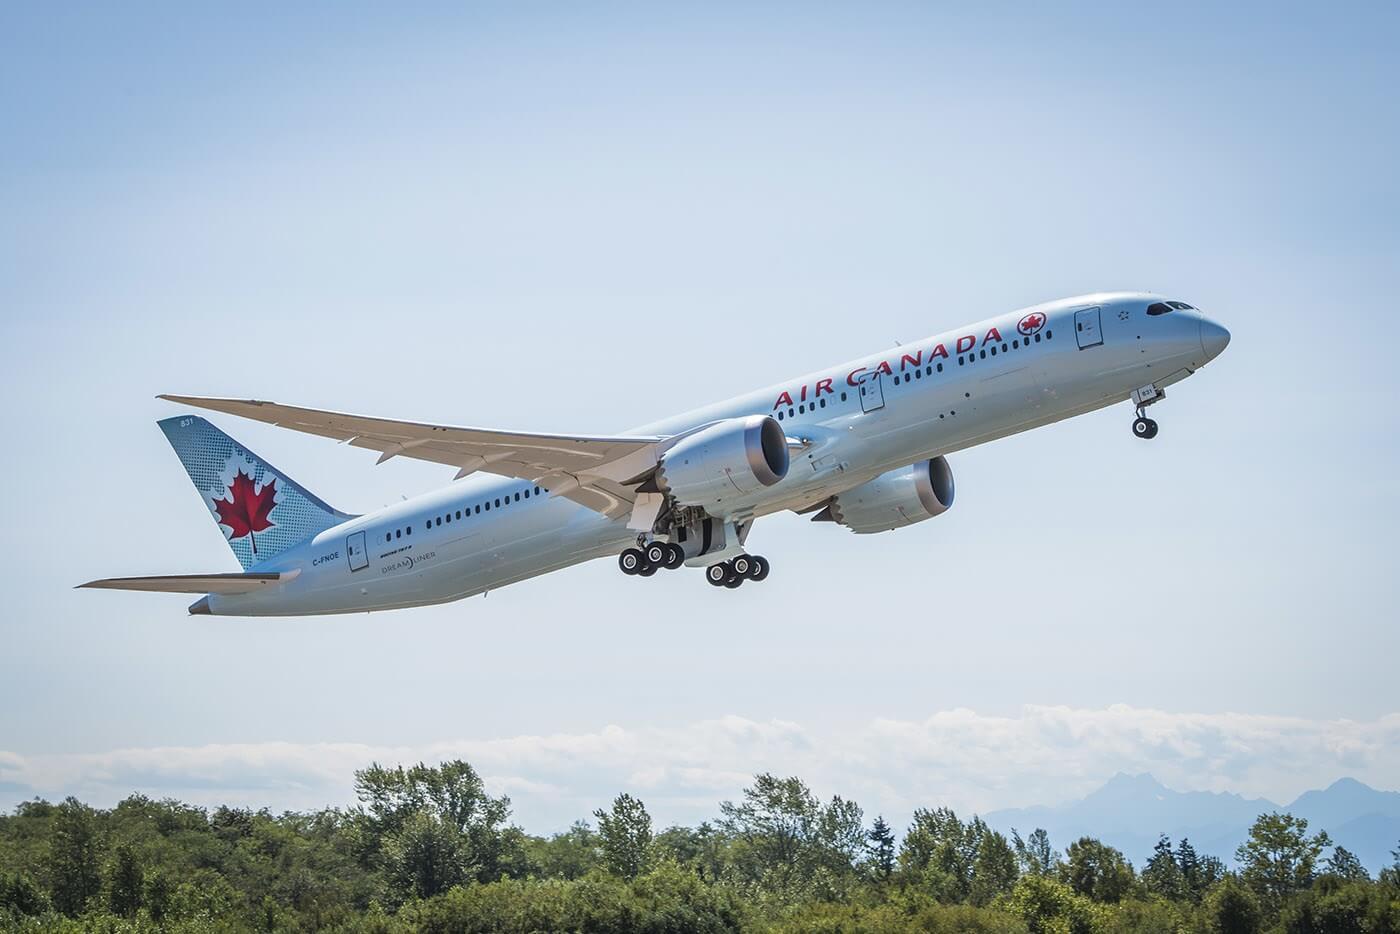 Air Canada celebrates 25 years of service to Seoul, South Korea